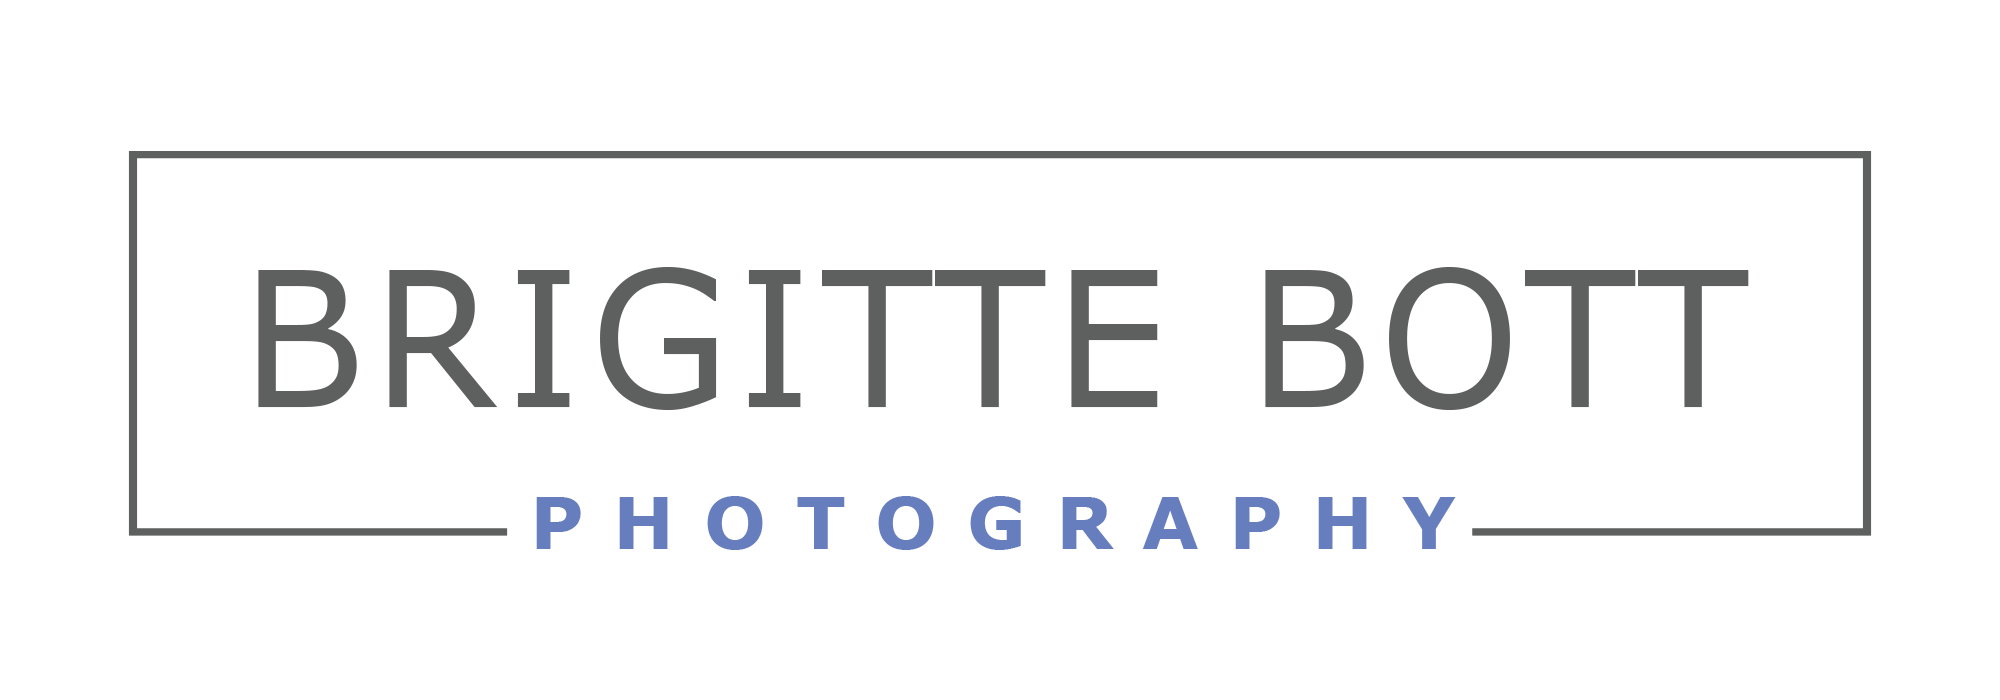 BRIGITTE BOTT PHOTOGRAPHY